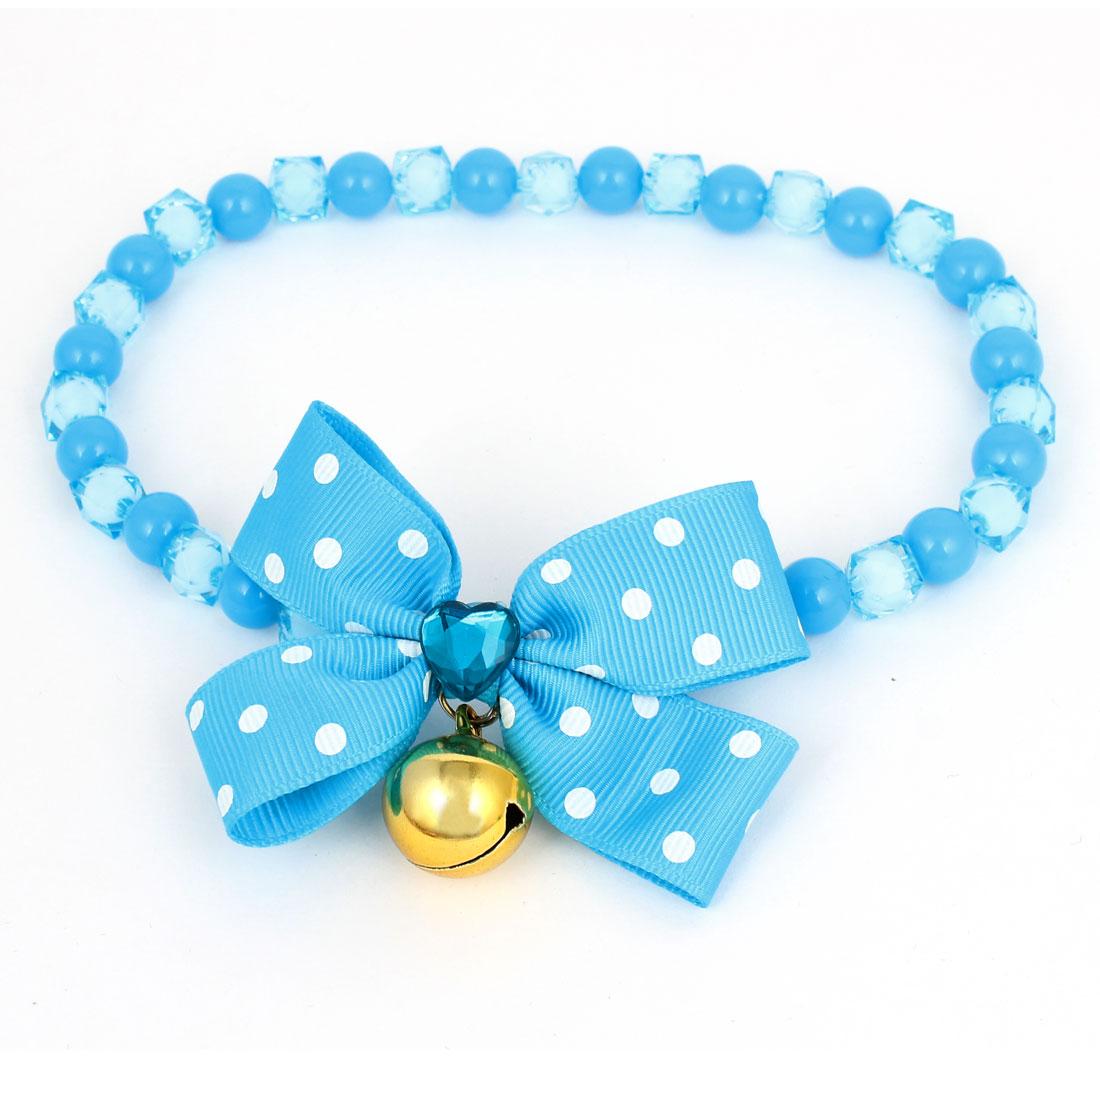 Metal Bell Pendant Bowtie Accent Pet Dog Plastic Beads Collar Necklace Blue L